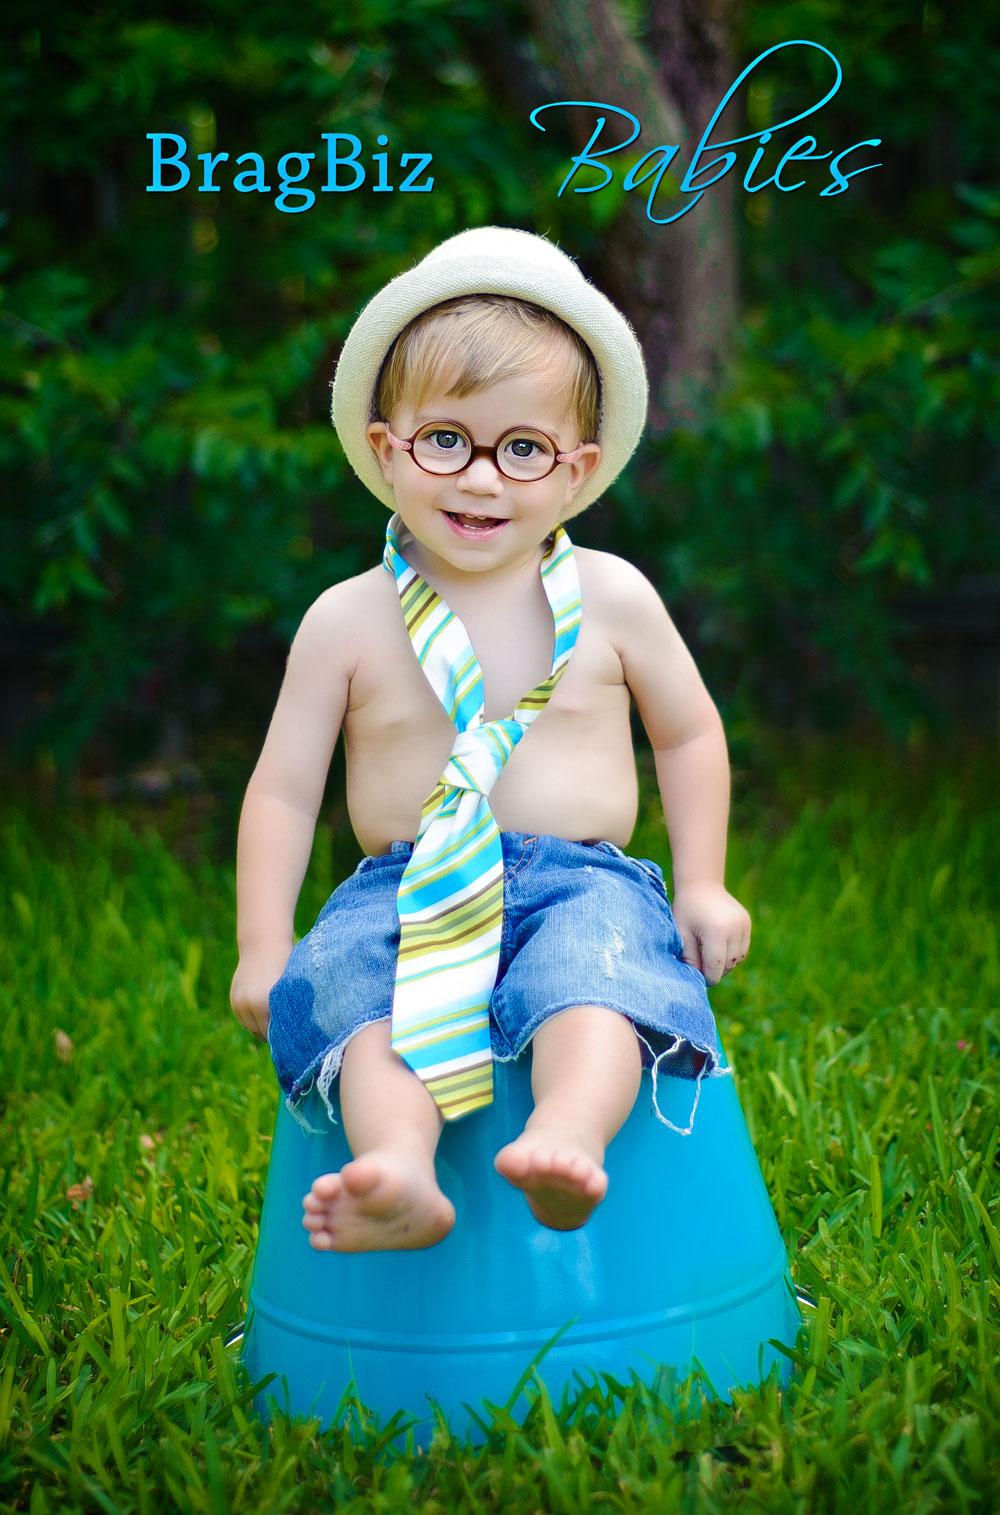 baby-artist-in-austin-texas-bragbiz-lindy-mowery